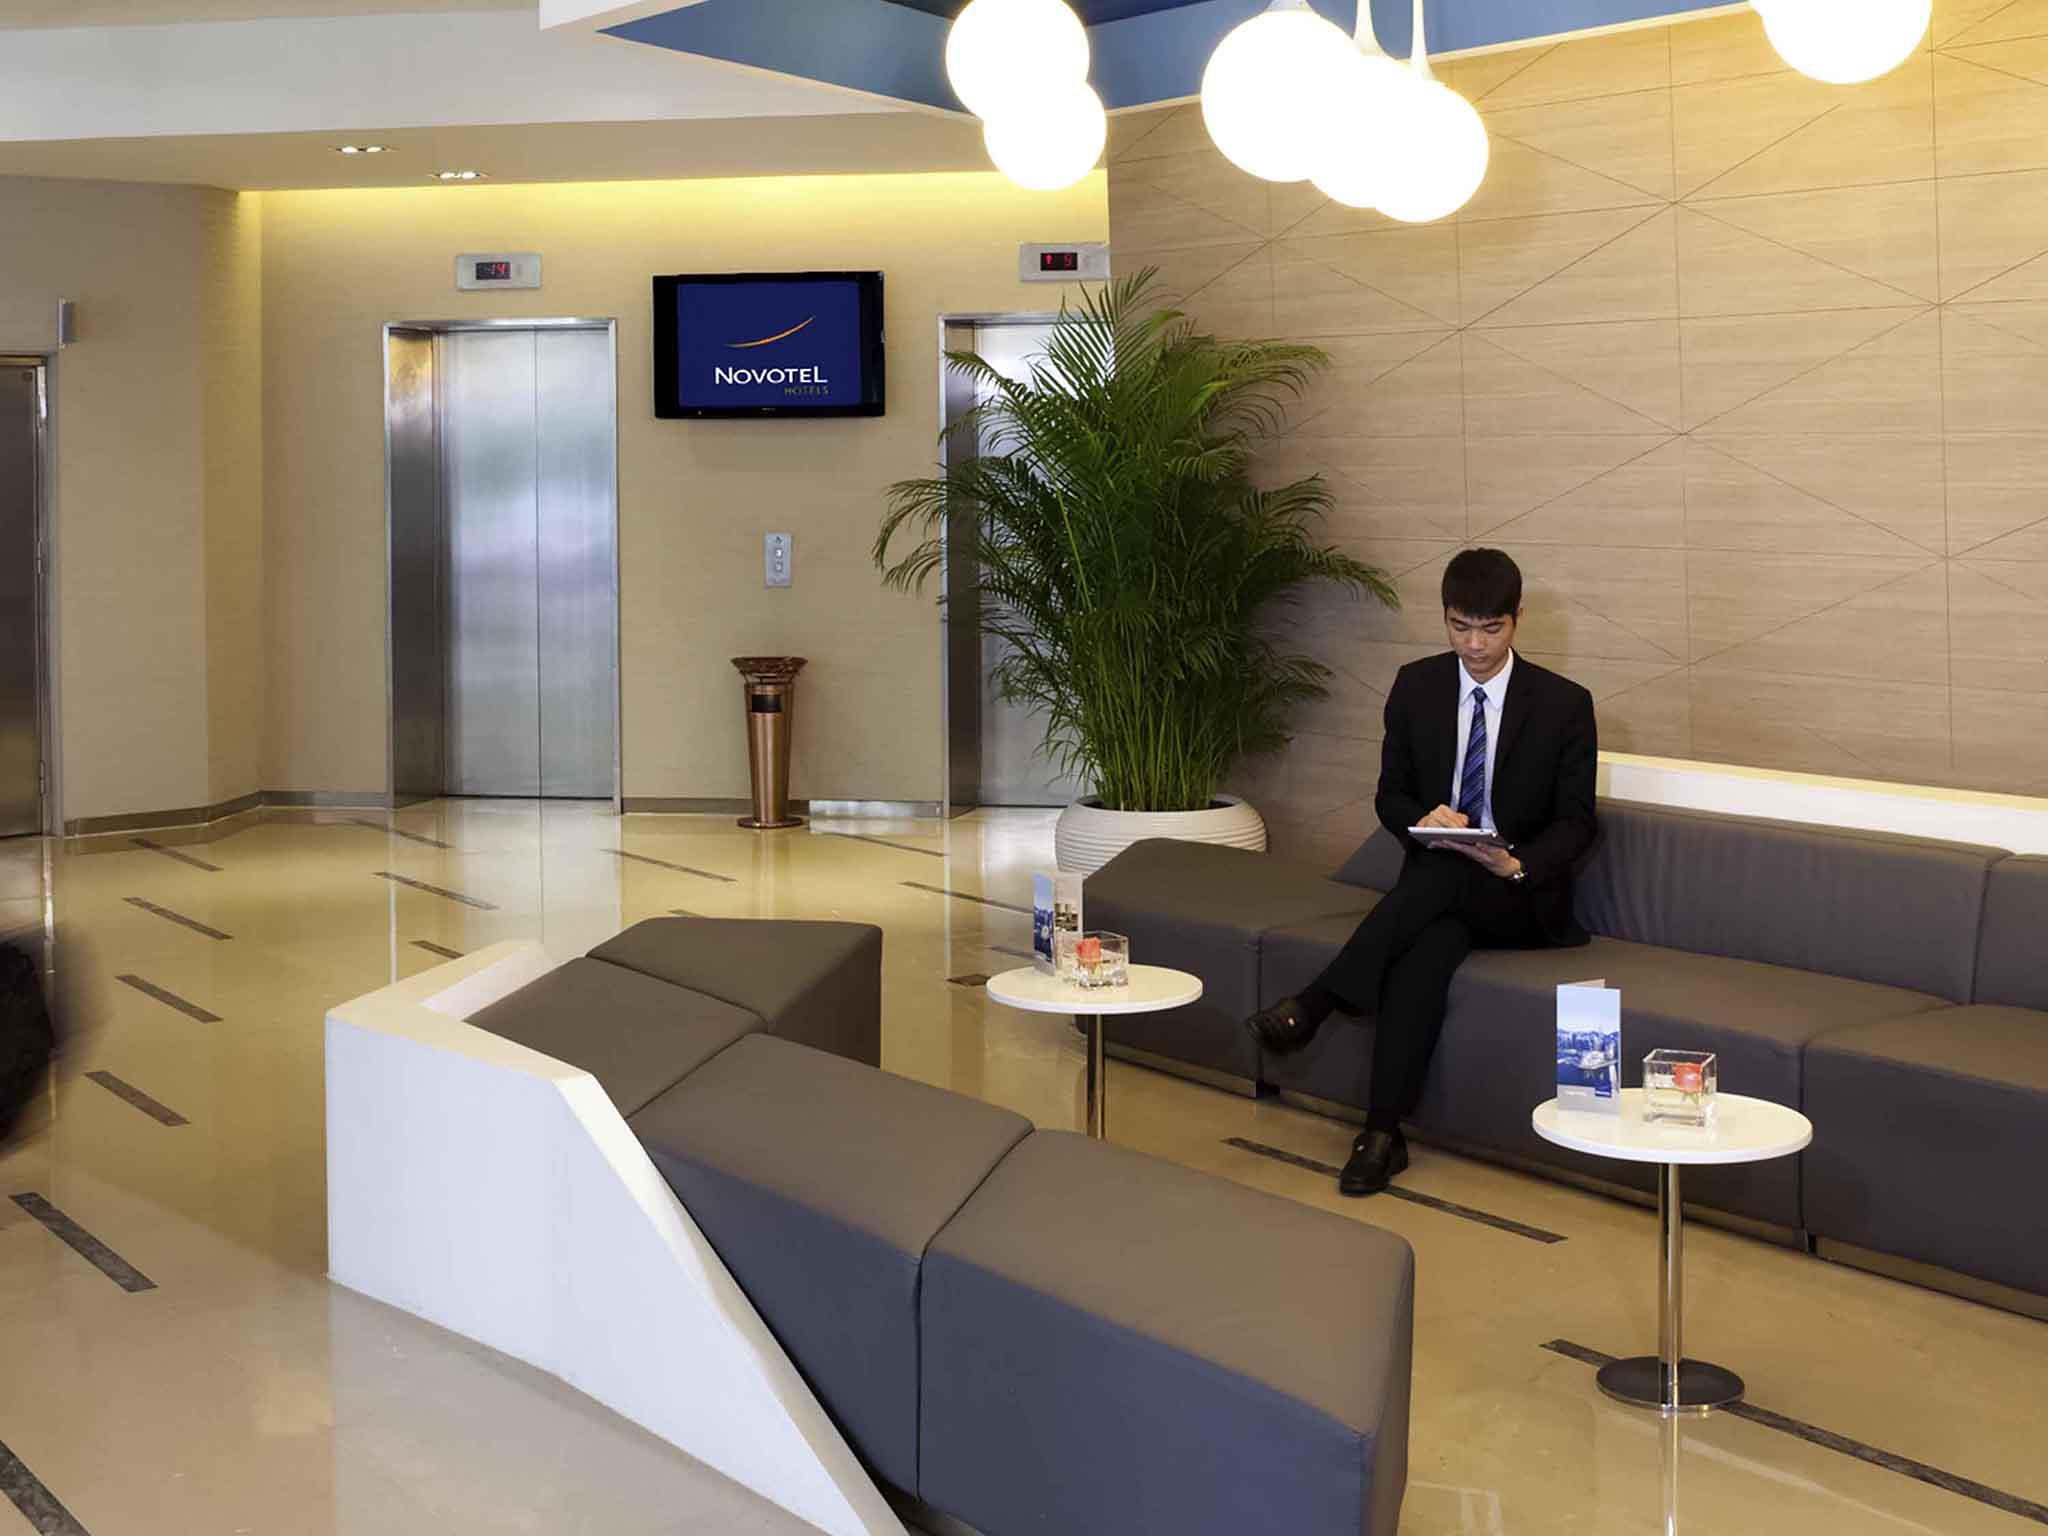 Hotel - Novotel Shenzhen Watergate